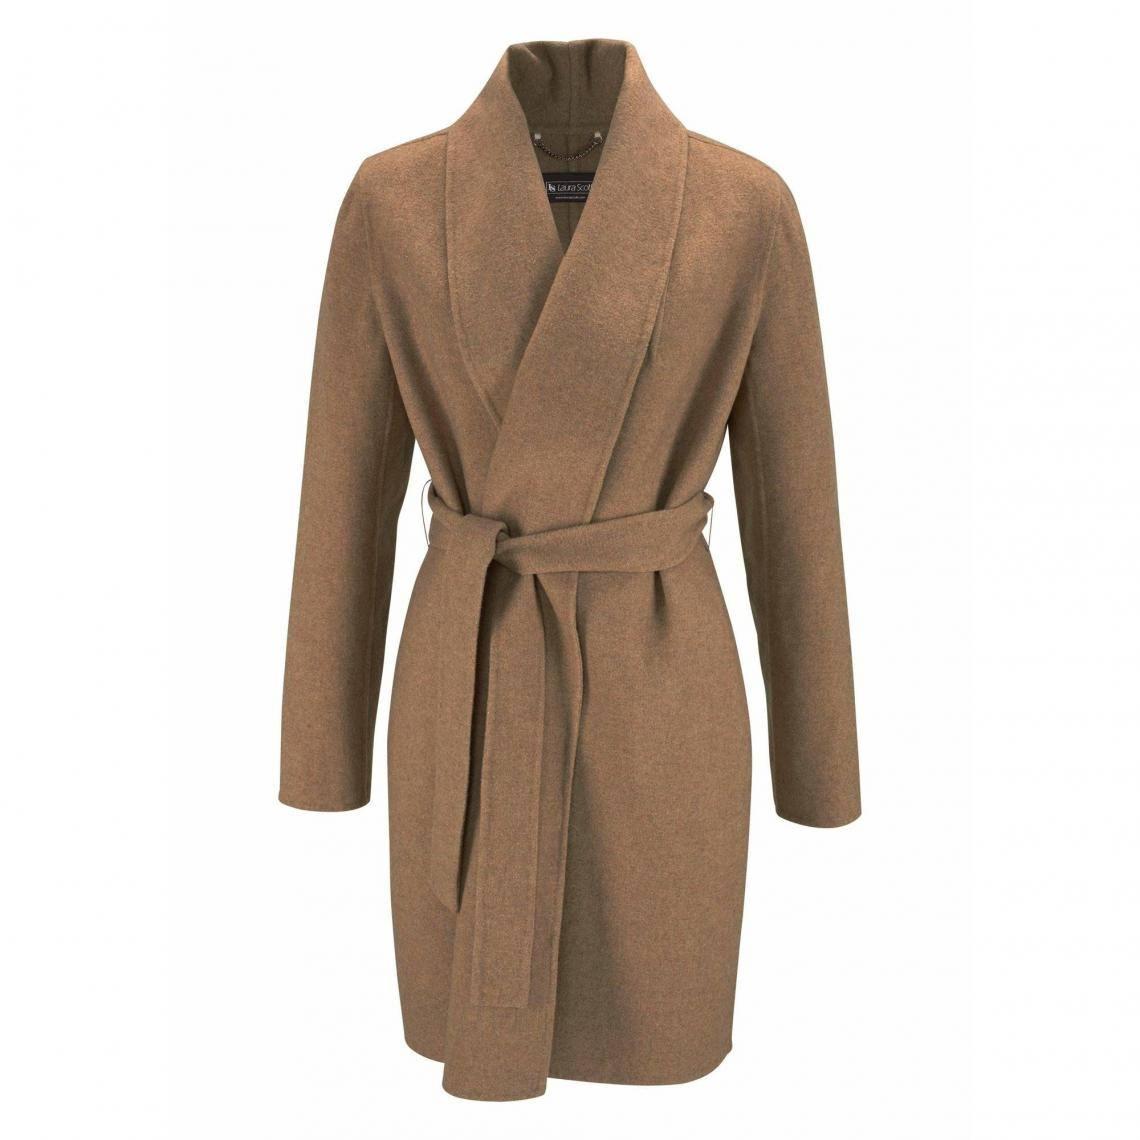 Promotion Shein Manteau col cascade avec cordon 2021 au Maroc